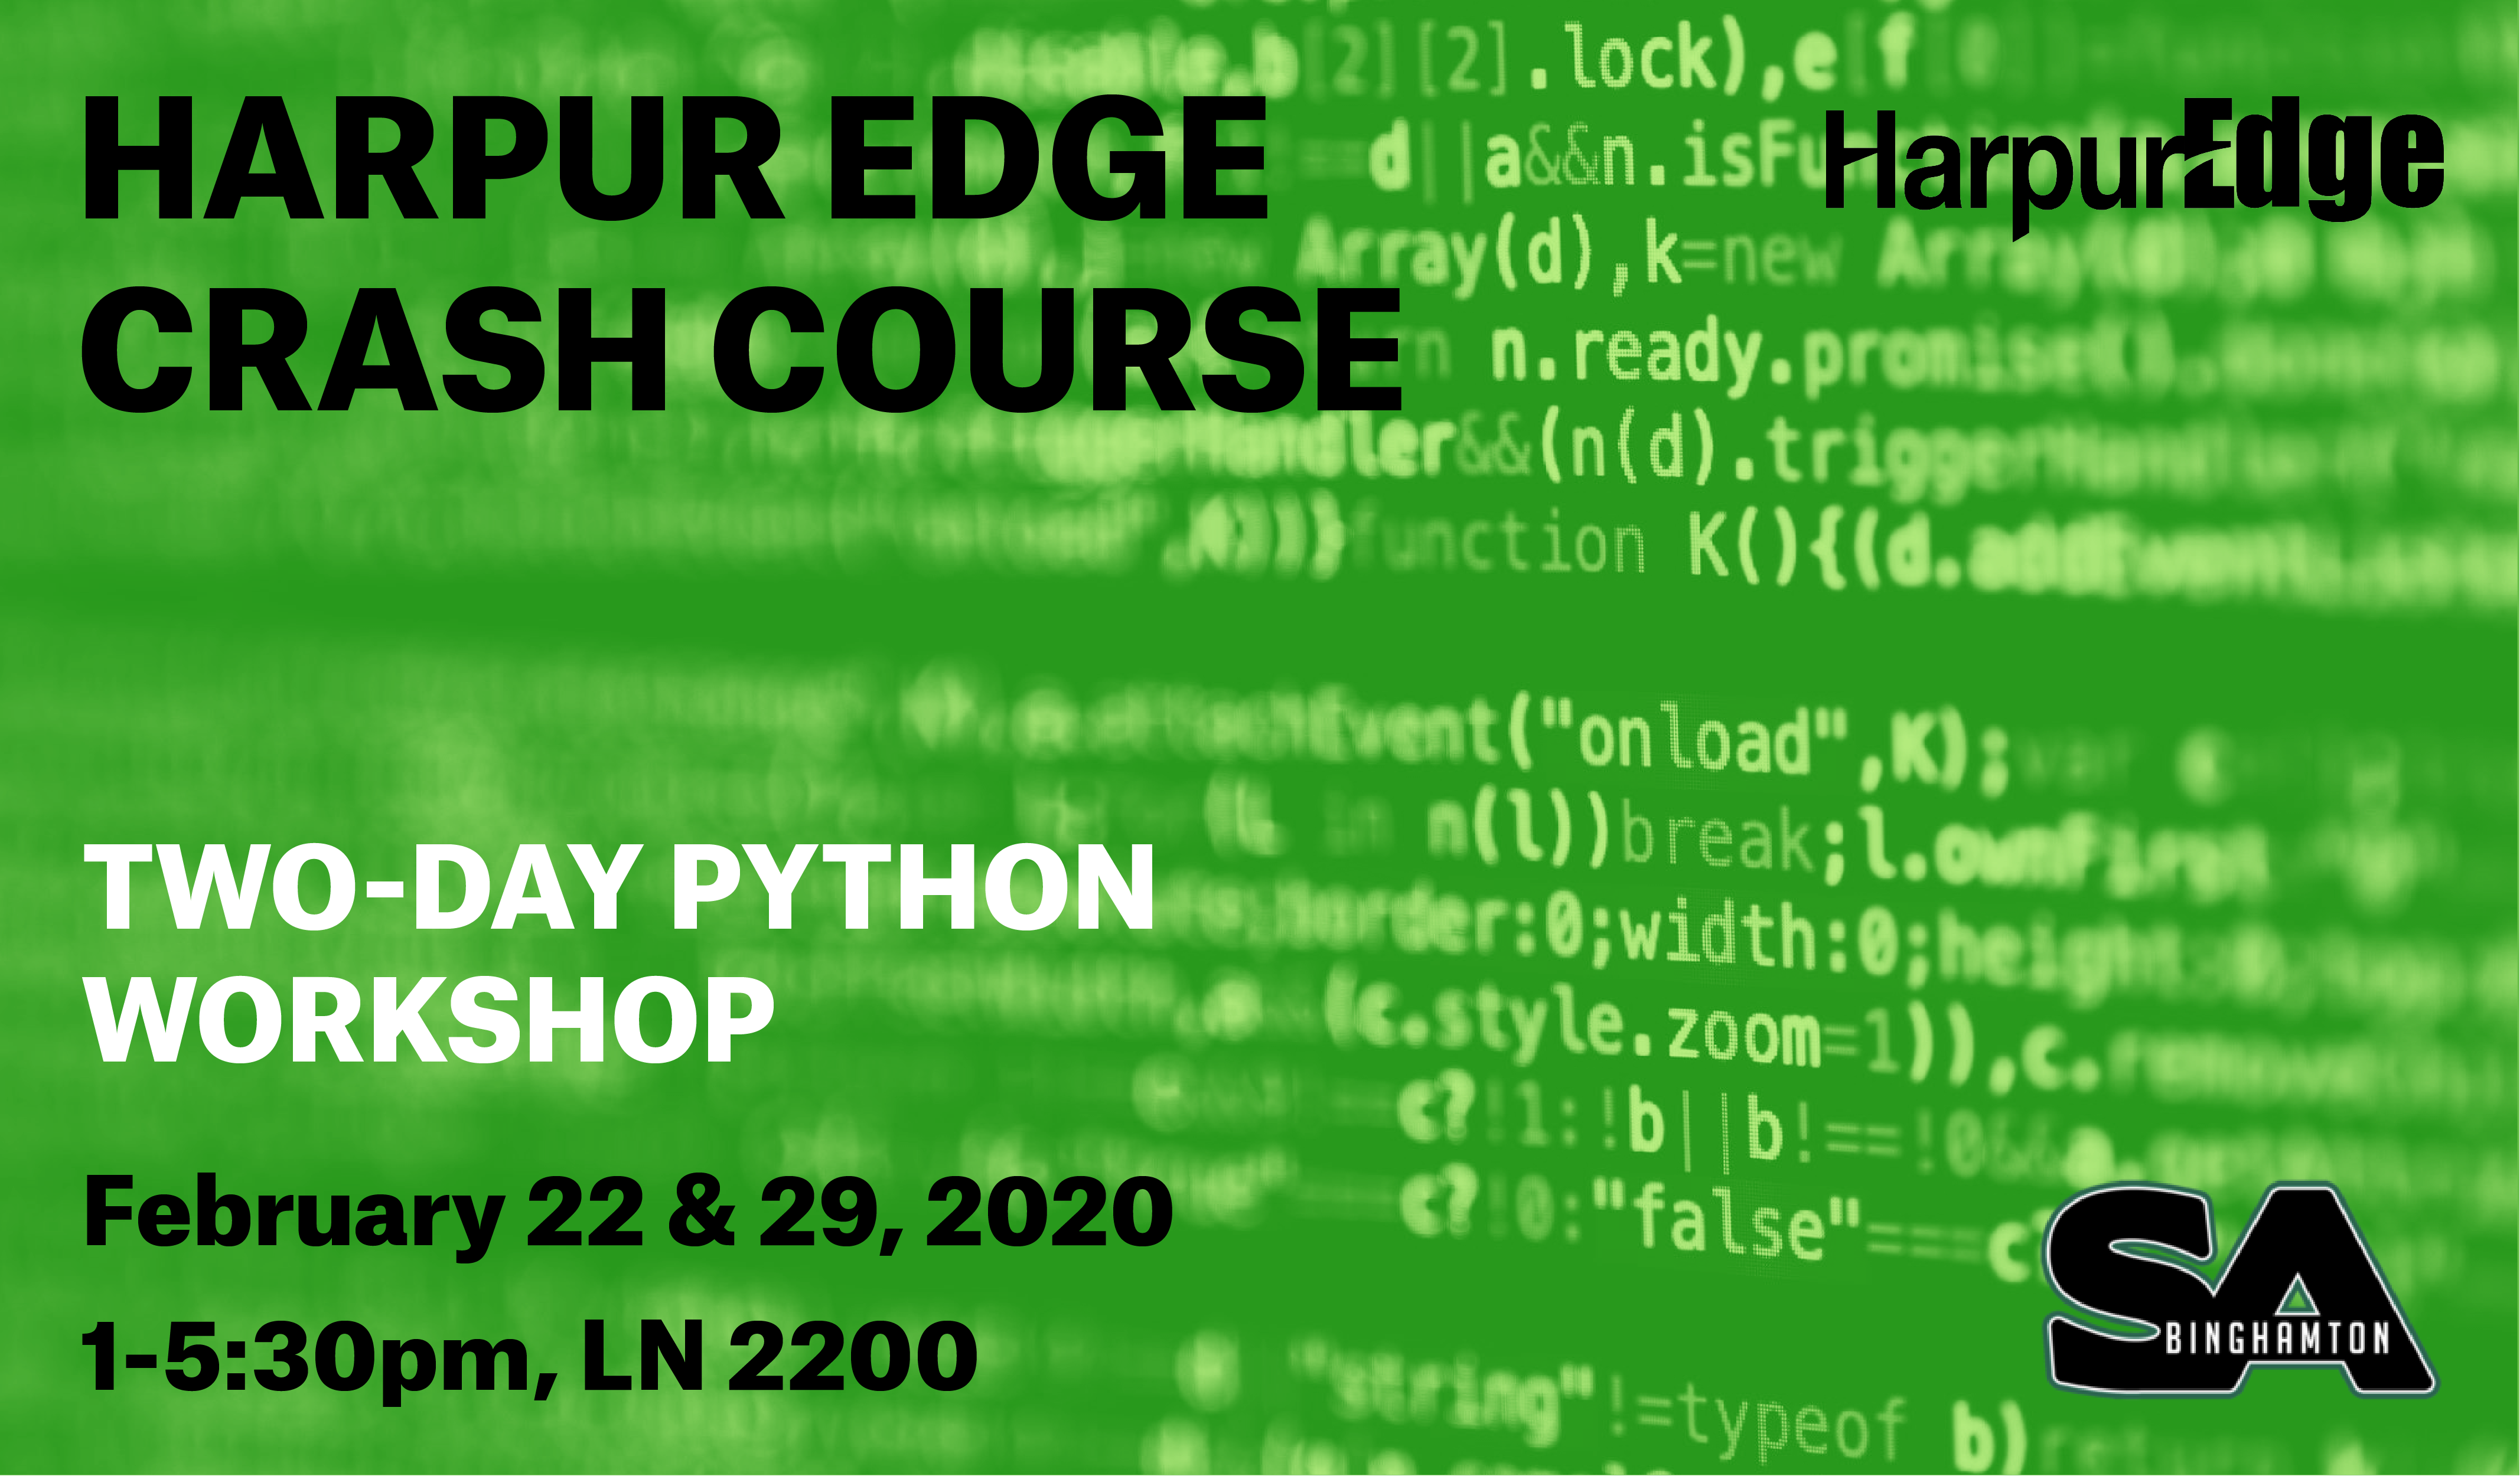 Harpur Edge Crash Course: 2 Day Python Workshop